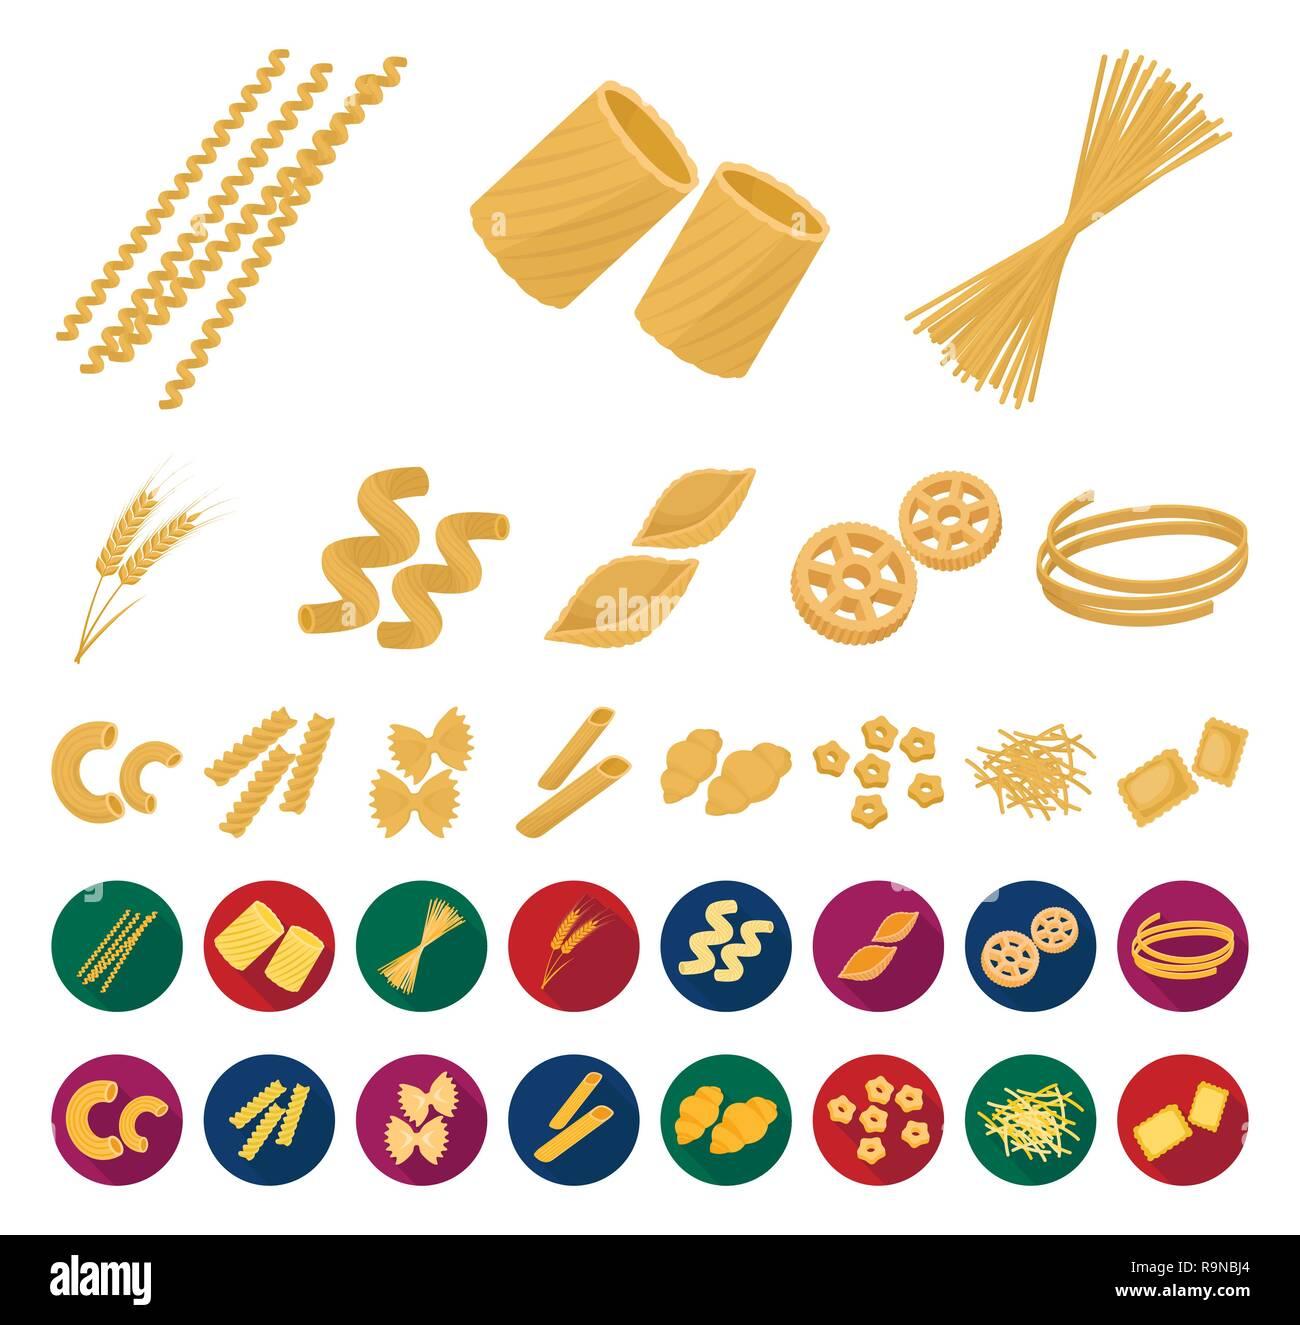 art,bucati,carbohydrate,cartoon,flat,cavatappi,cereal,chifferi,collection,conchiglie,design,ditalini,dough,ears,farfalle,figured,filini,food,fusilli,gnocchi,icon,illustration,isolated,logo,macaroni,pasta,penne,product,ravioli,rigate,rotelle,set,shape,sign,spaghetti,stelline,symbol,tagliatelle,types,vector,web,wheat Vector Vectors , Stock Vector